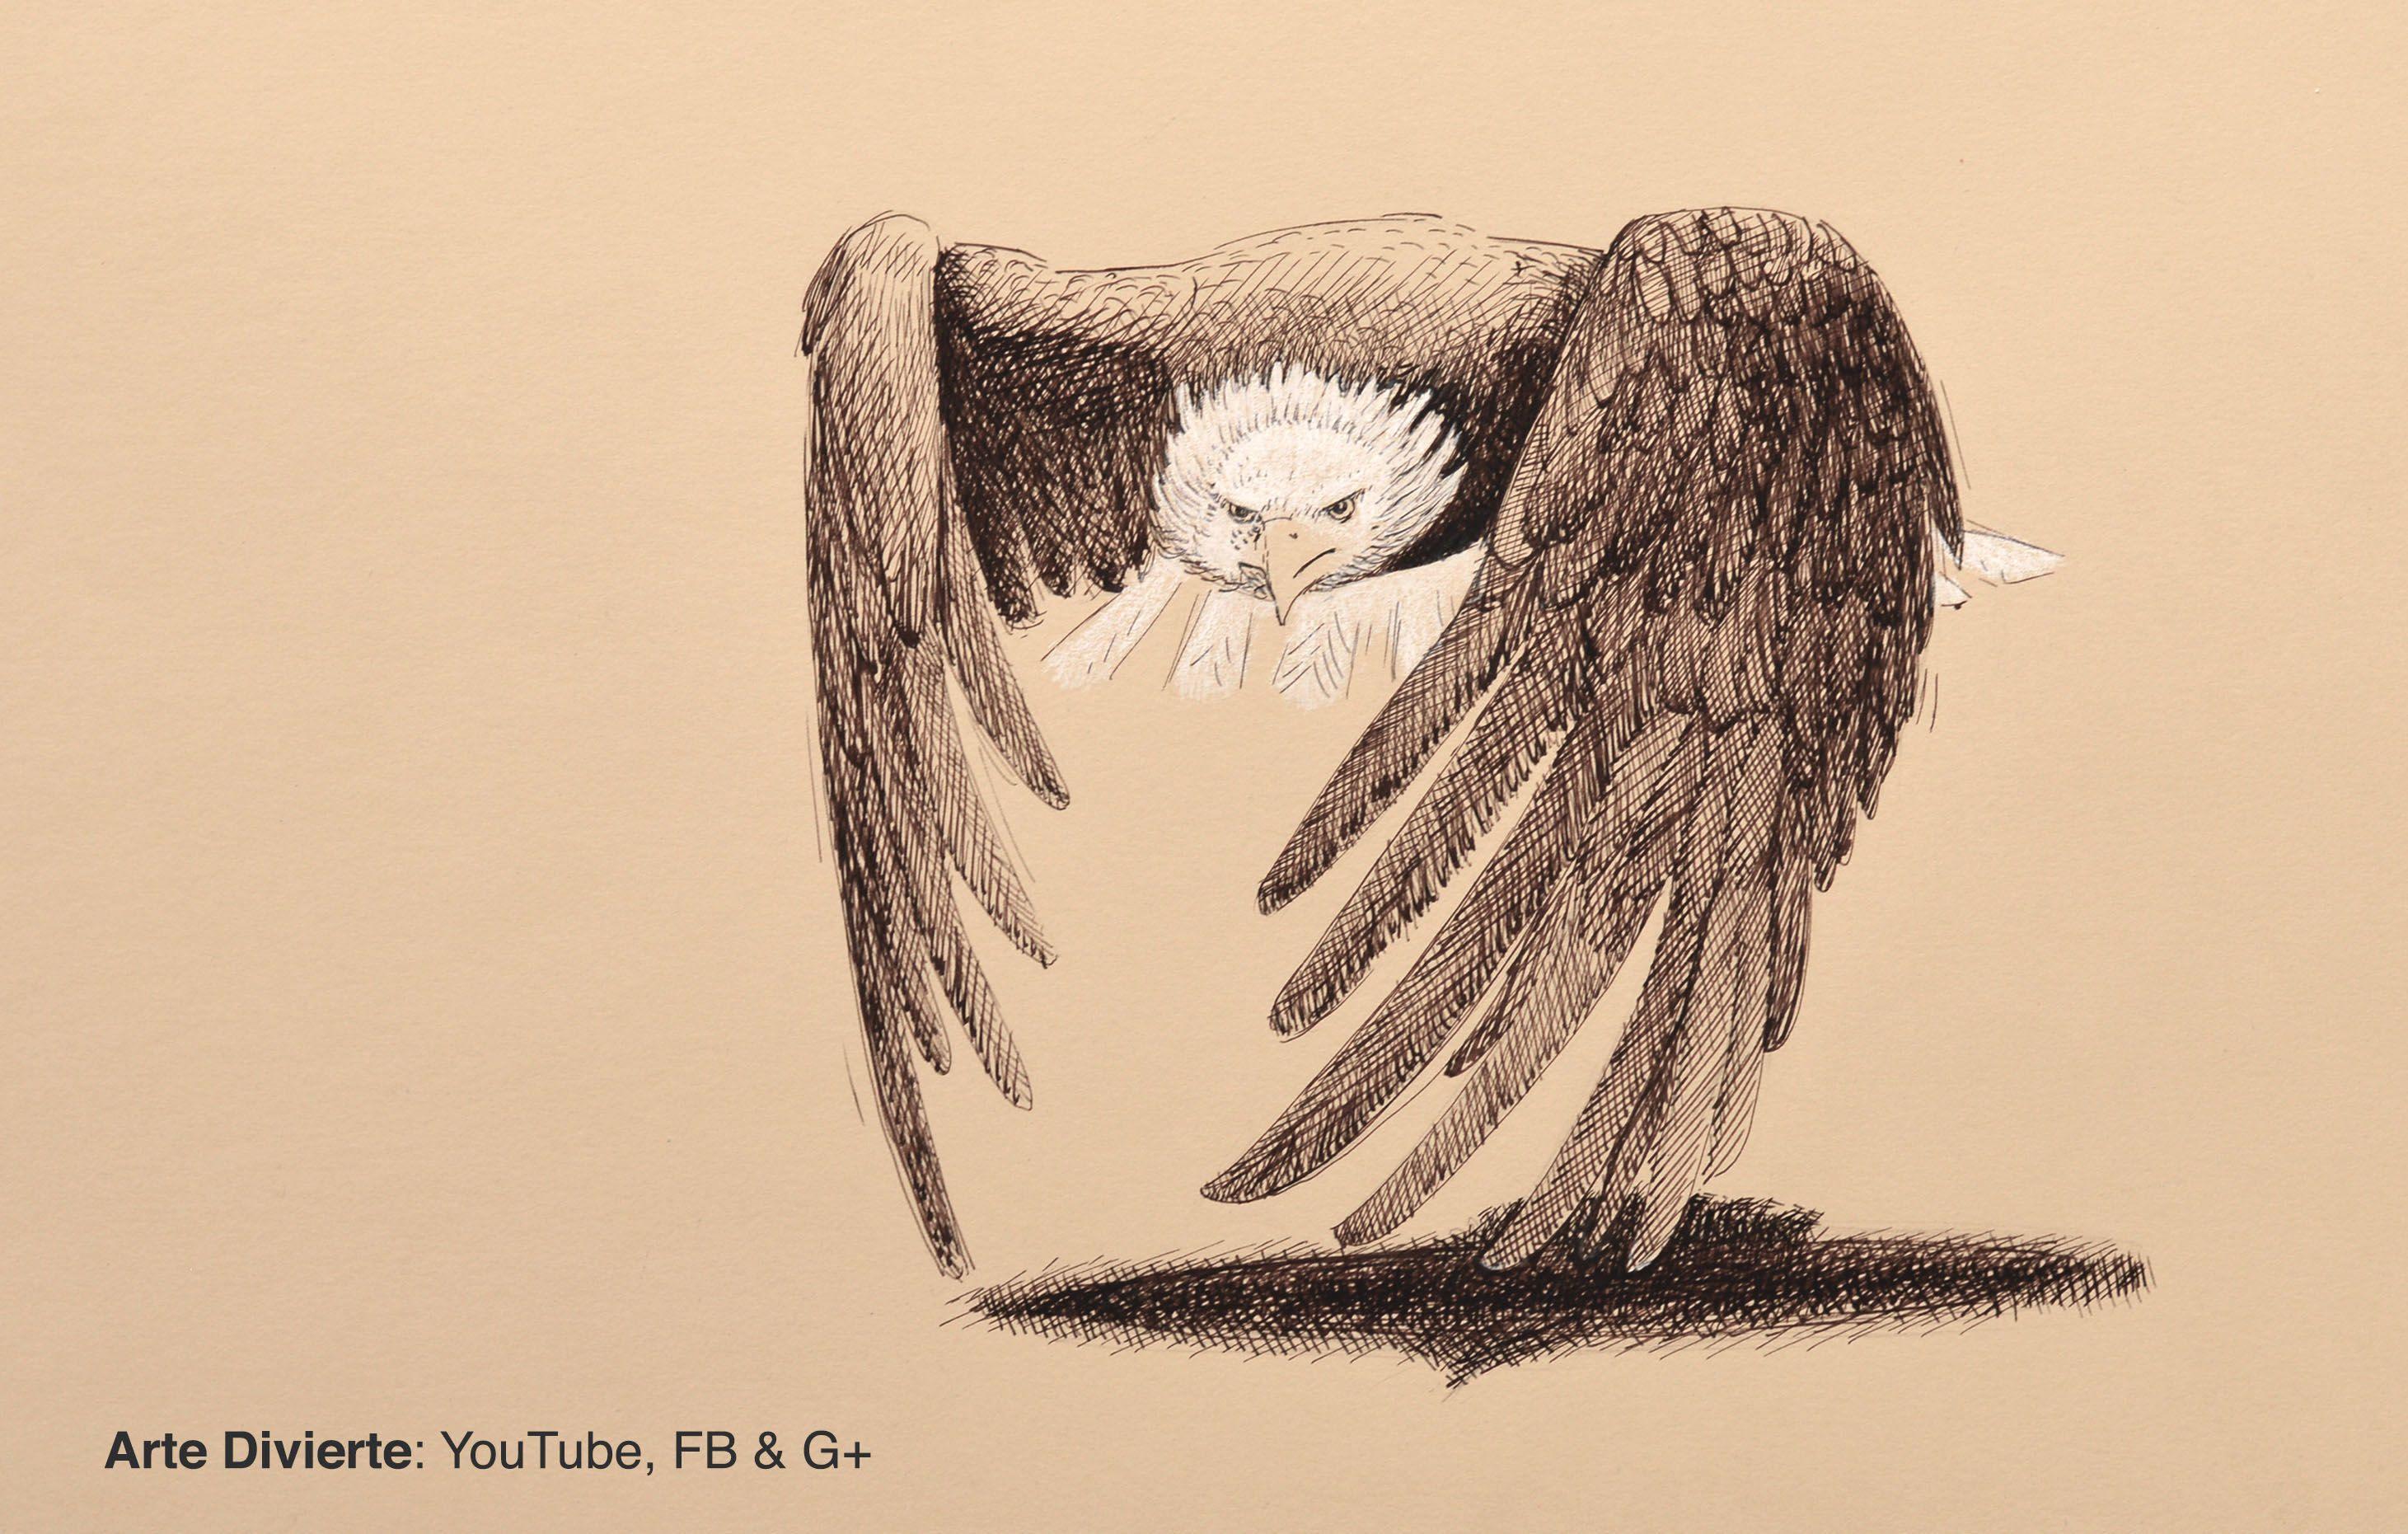 Cmo dibujar un guila de cabeza blanca con pluma fuente arte